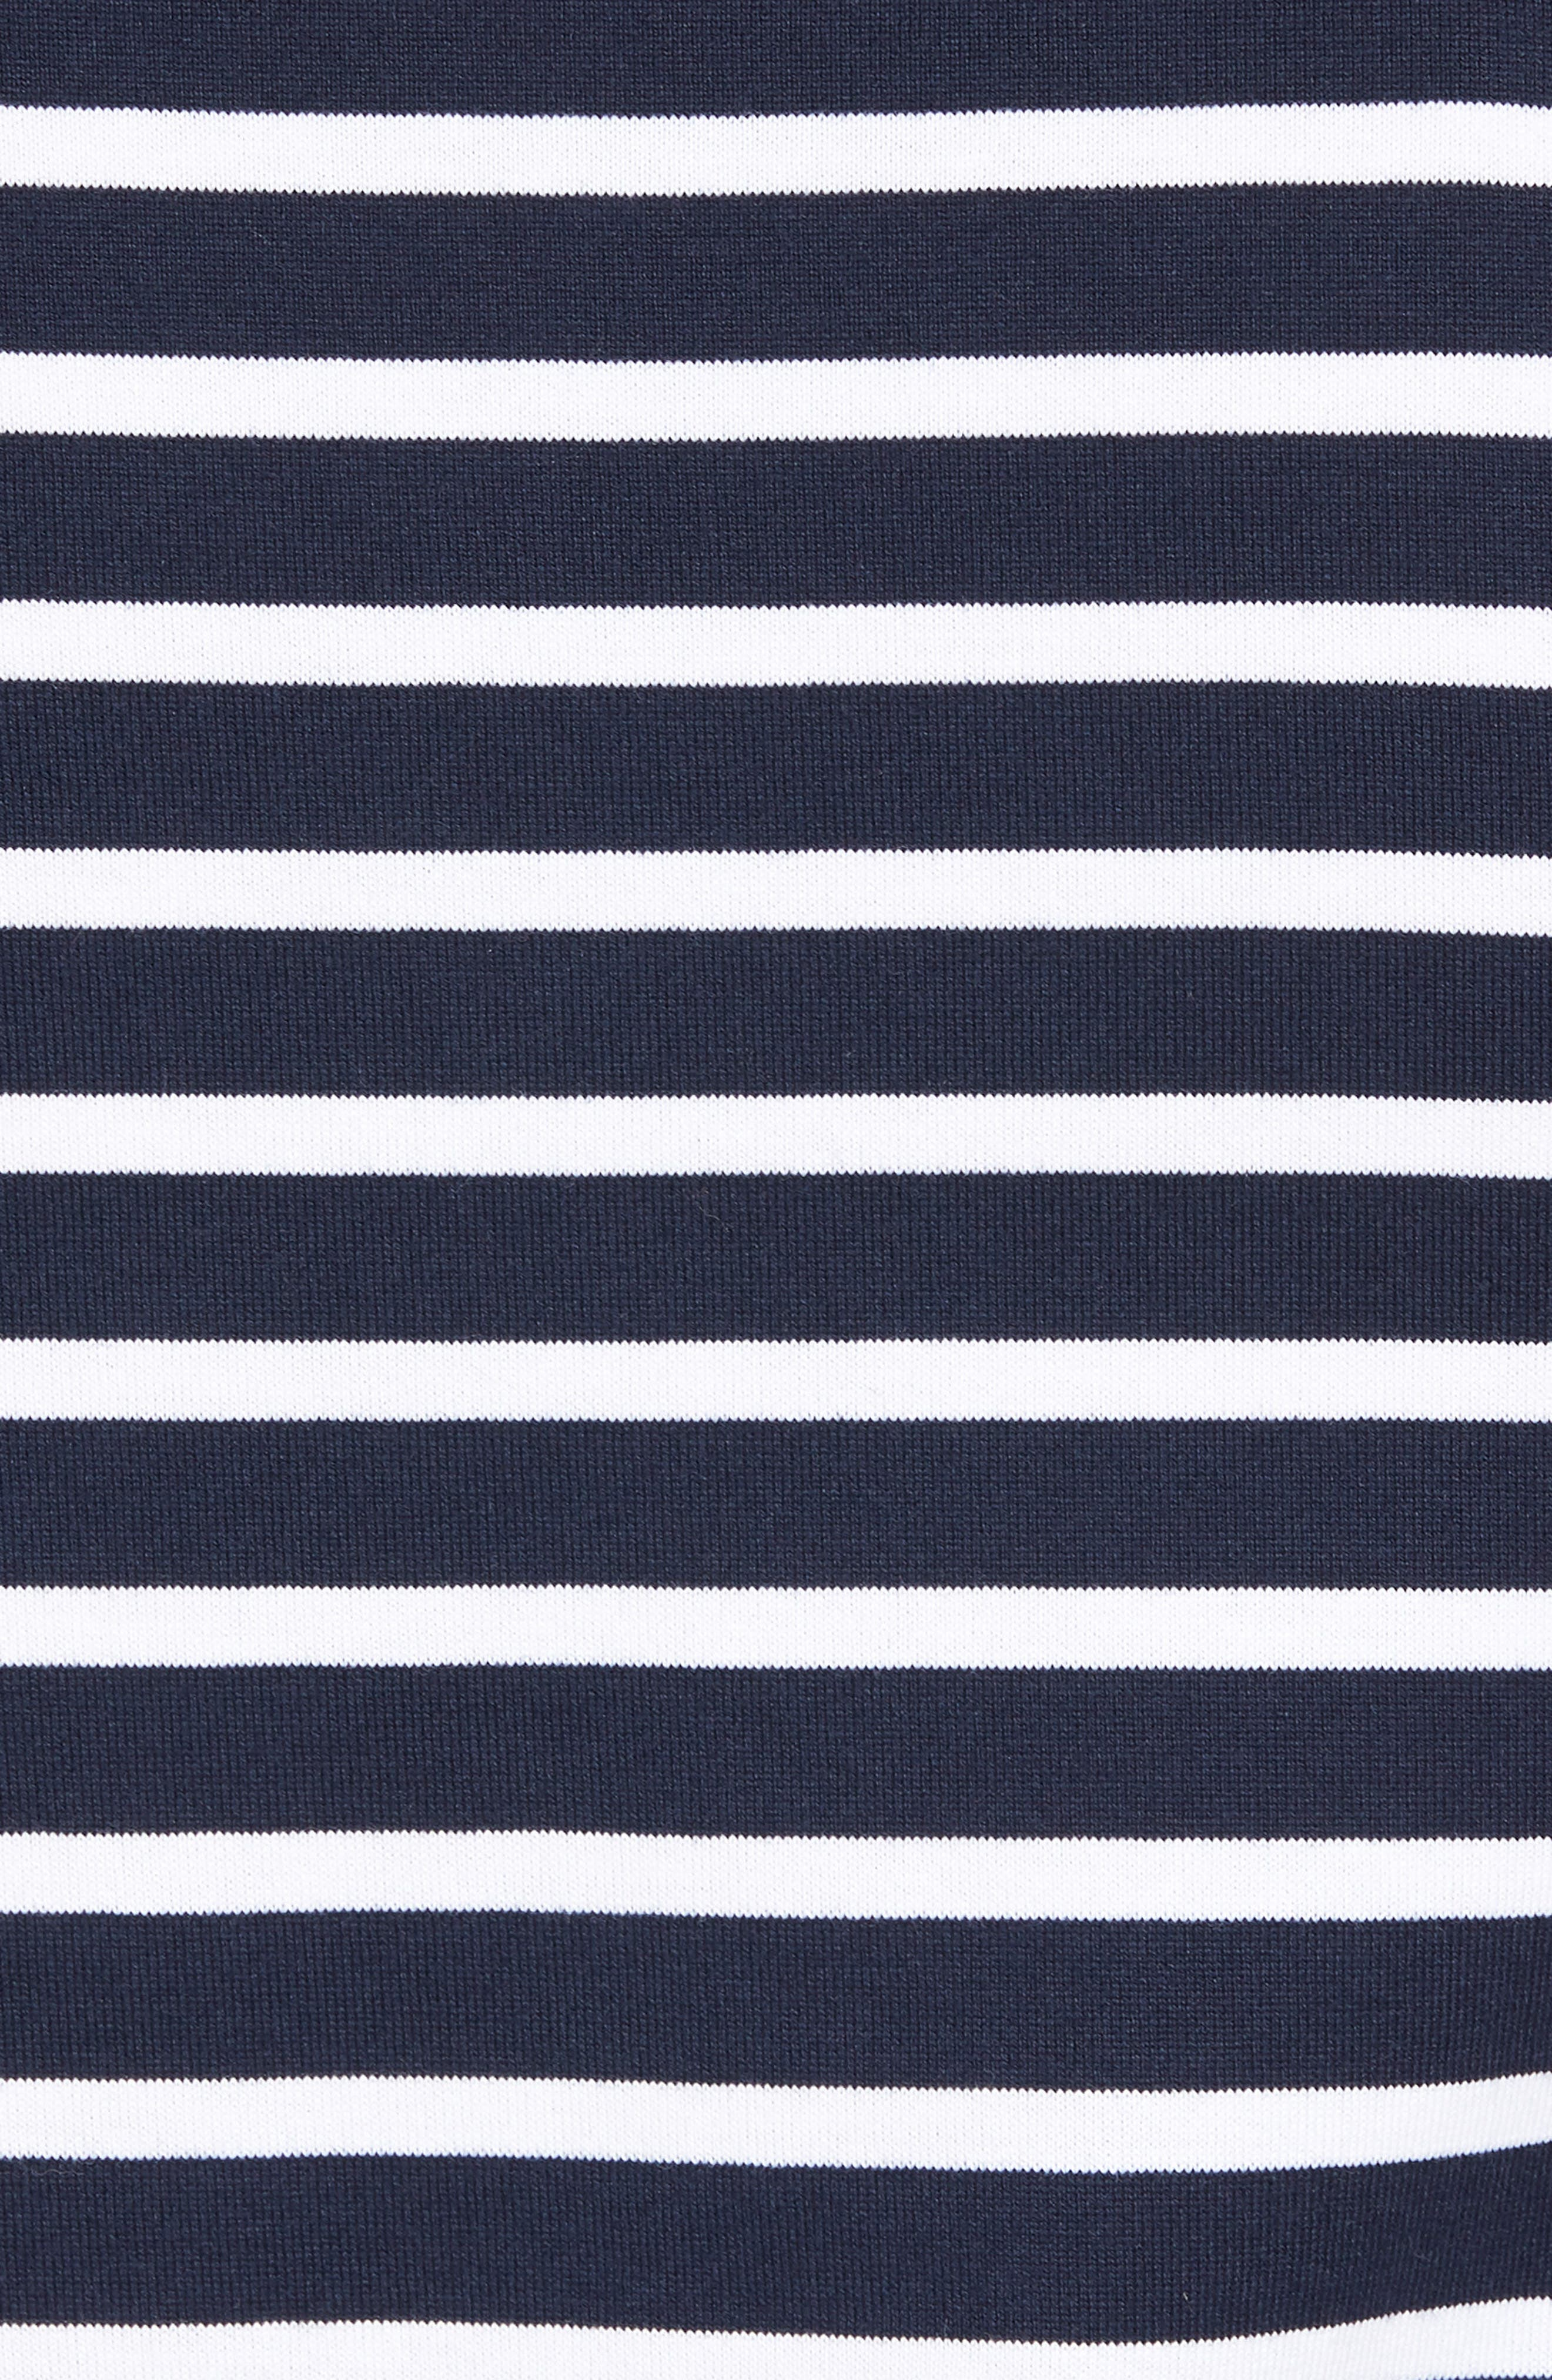 Tessler Stripe Crewneck T-Shirt,                             Alternate thumbnail 5, color,                             410